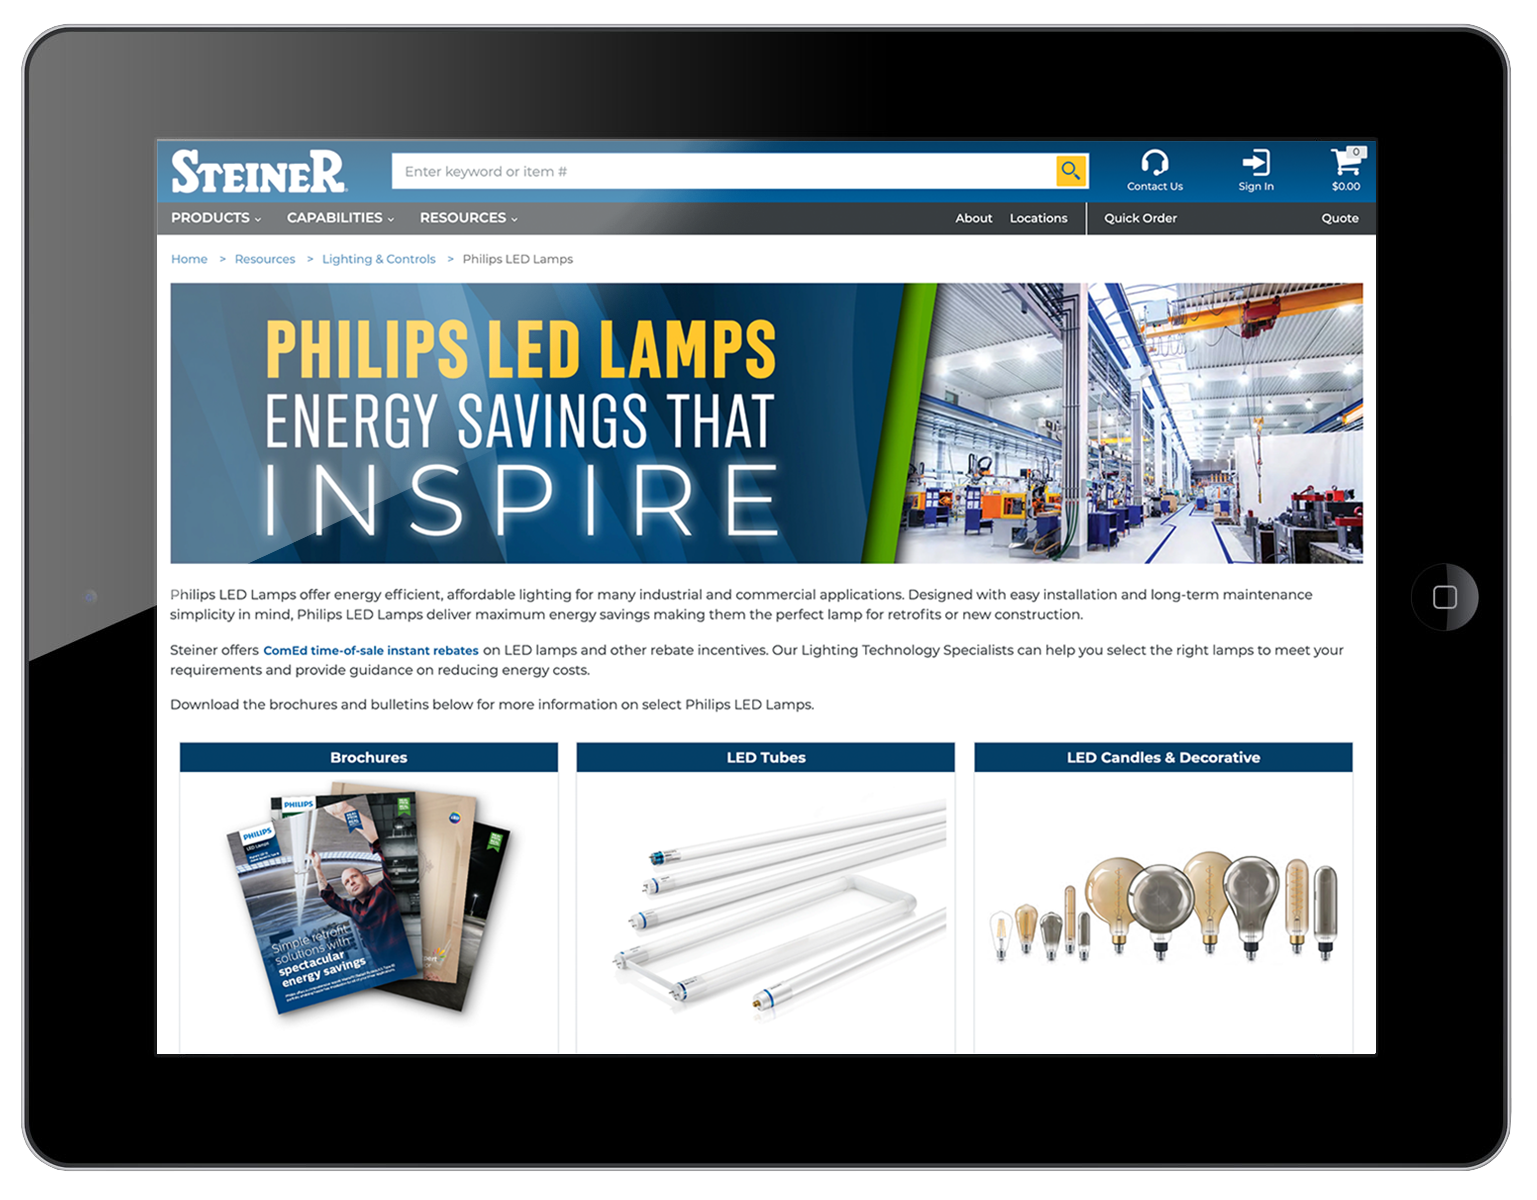 Phillips LED Lamps